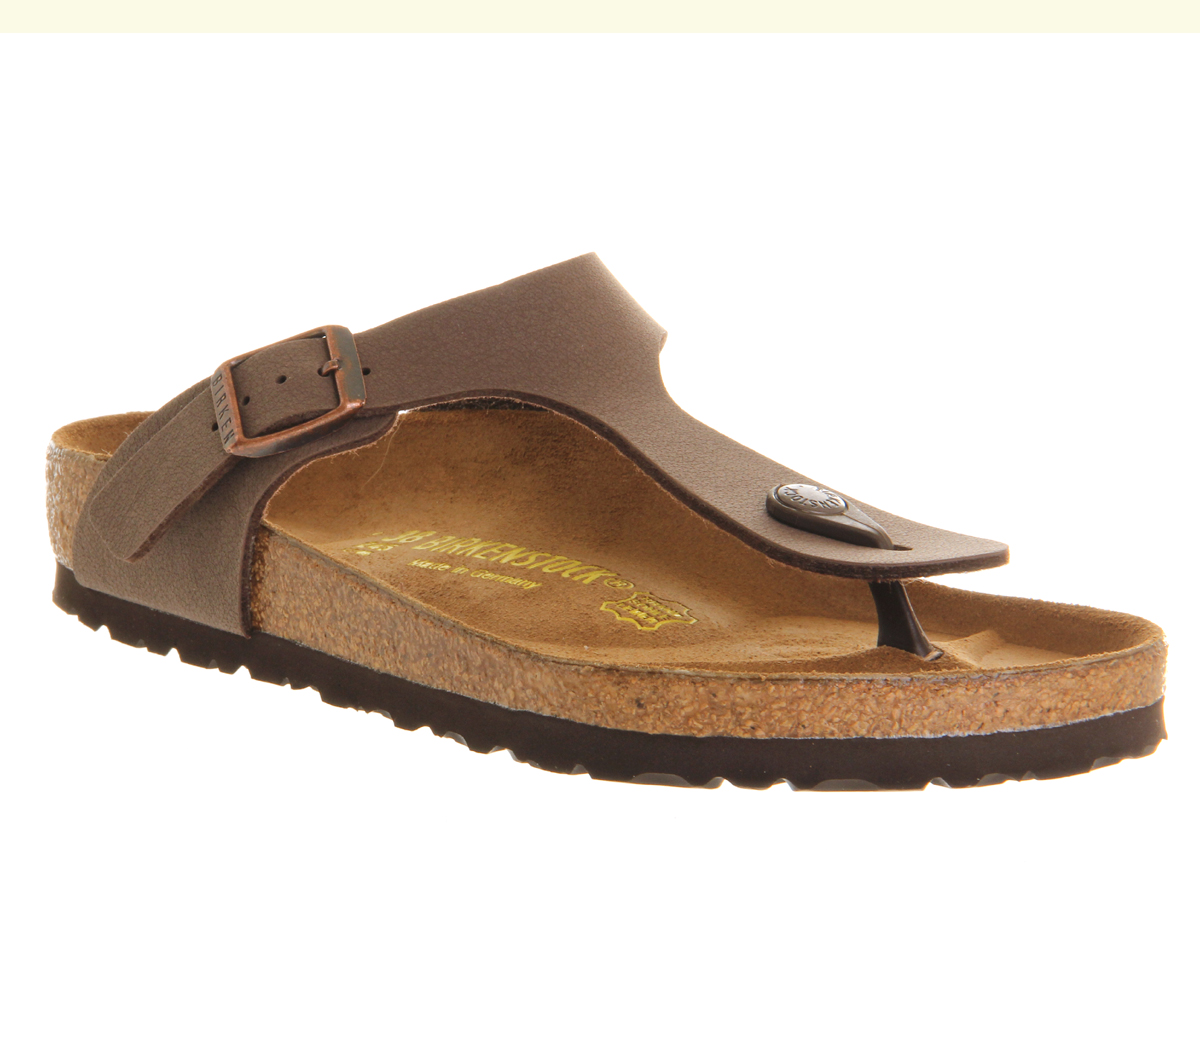 Womens-Birkenstock-Gizeh-Toe-Thong-Footbed-BROWN-MOCA-